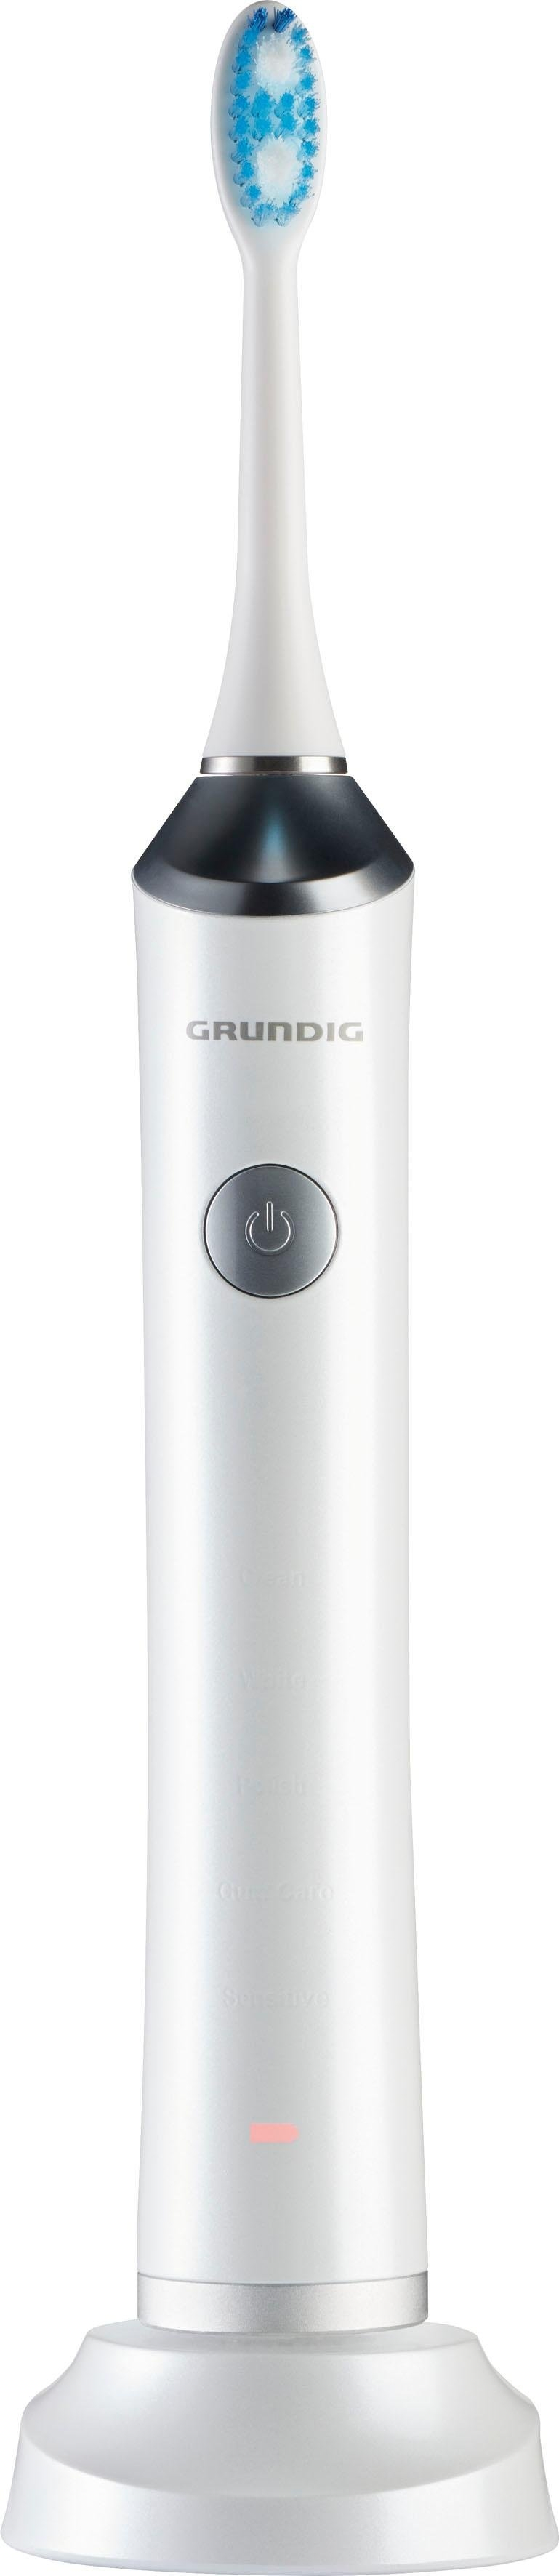 Grundig sonische tandenborstel TB 8730, 2 opzetborsteltjes - verschillende betaalmethodes